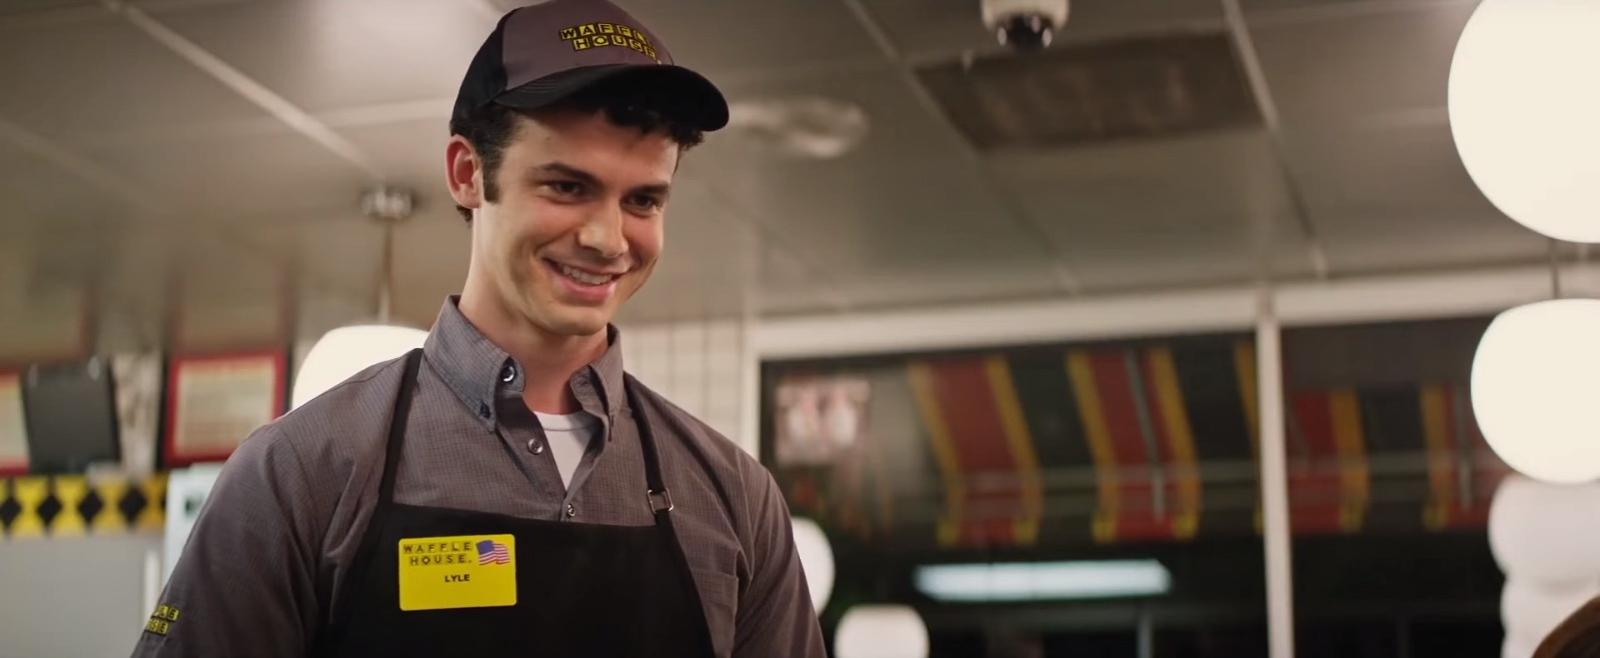 Waffle House in Love, Simon (2018)